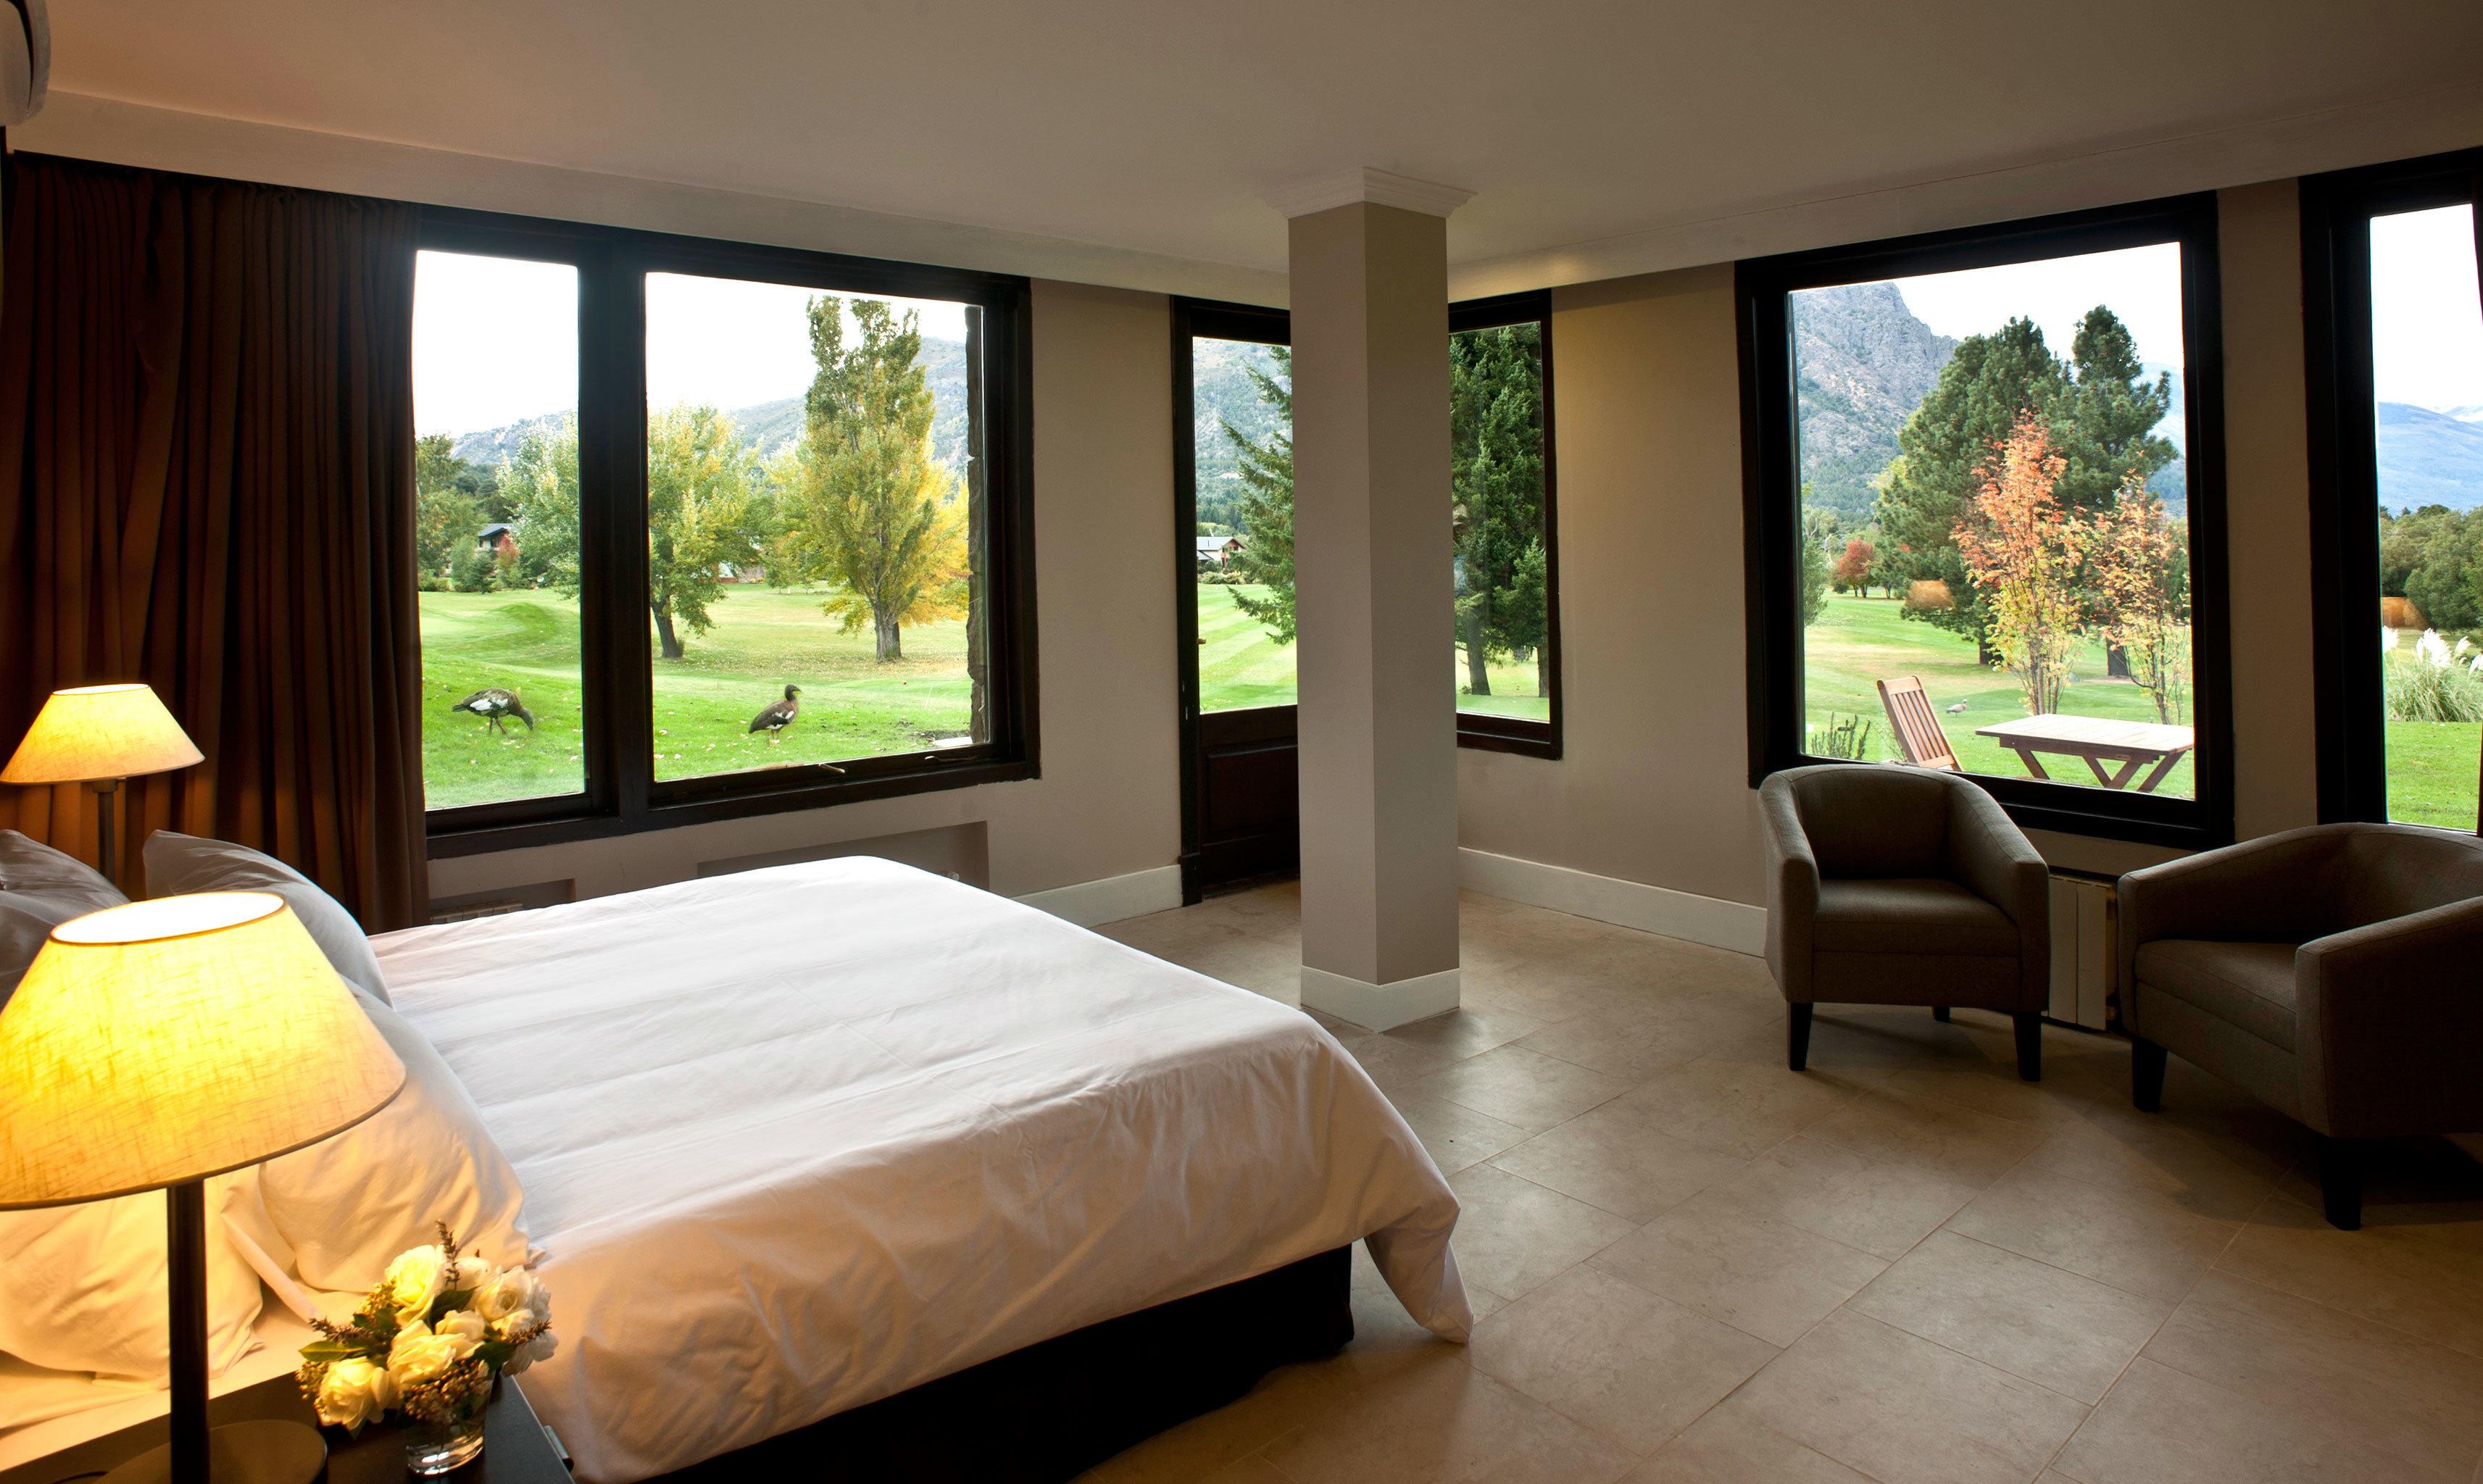 Bedroom Country Lodge Rustic property Suite living room home condominium Villa Resort cottage nice overlooking